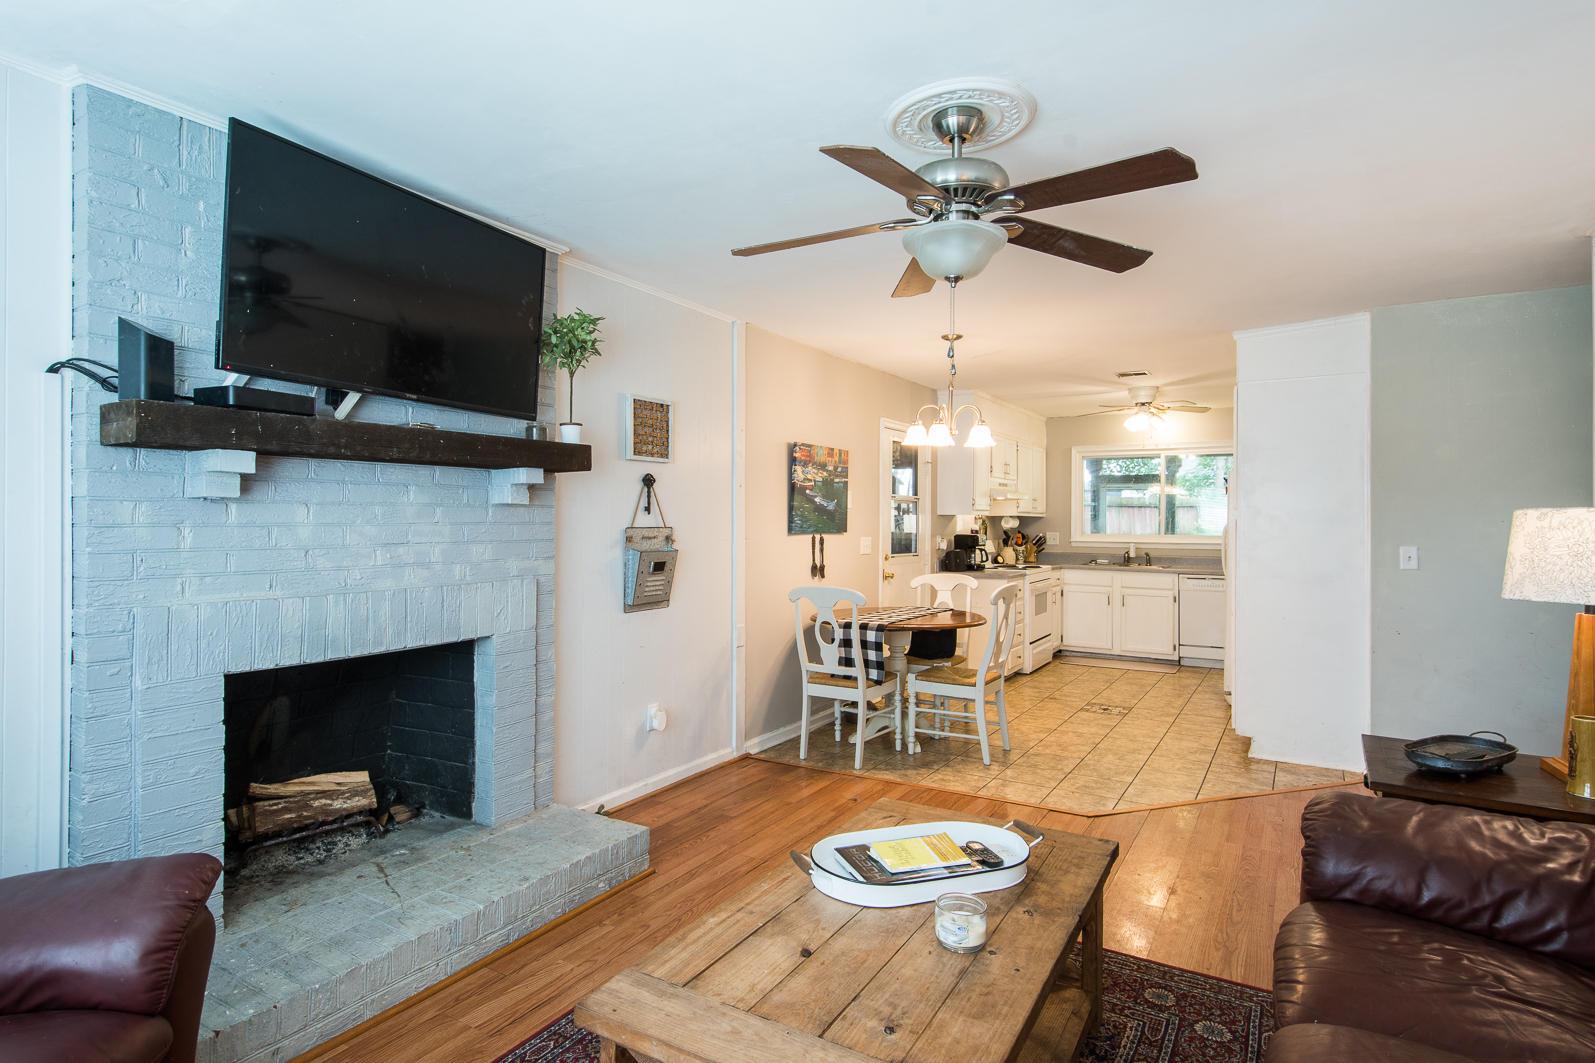 Wando East Homes For Sale - 1605 Babington, Mount Pleasant, SC - 27